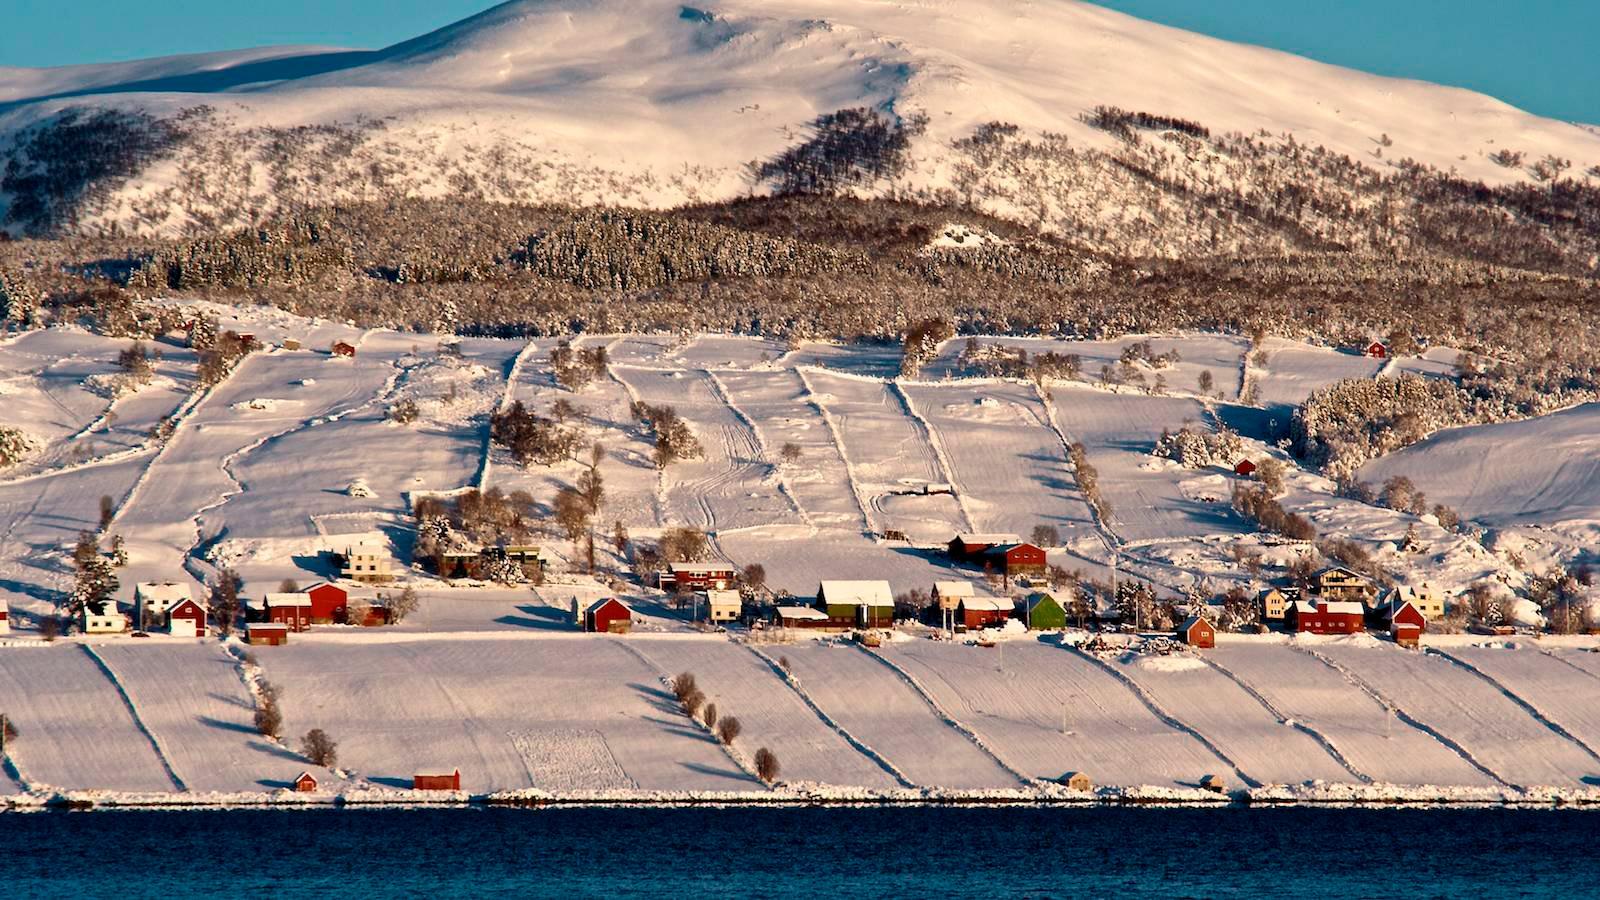 Skallan-Rå i Kvæfjord kommune i Troms er et fjordlandskap med intakt teigstruktur. Foto: Robert Nygård